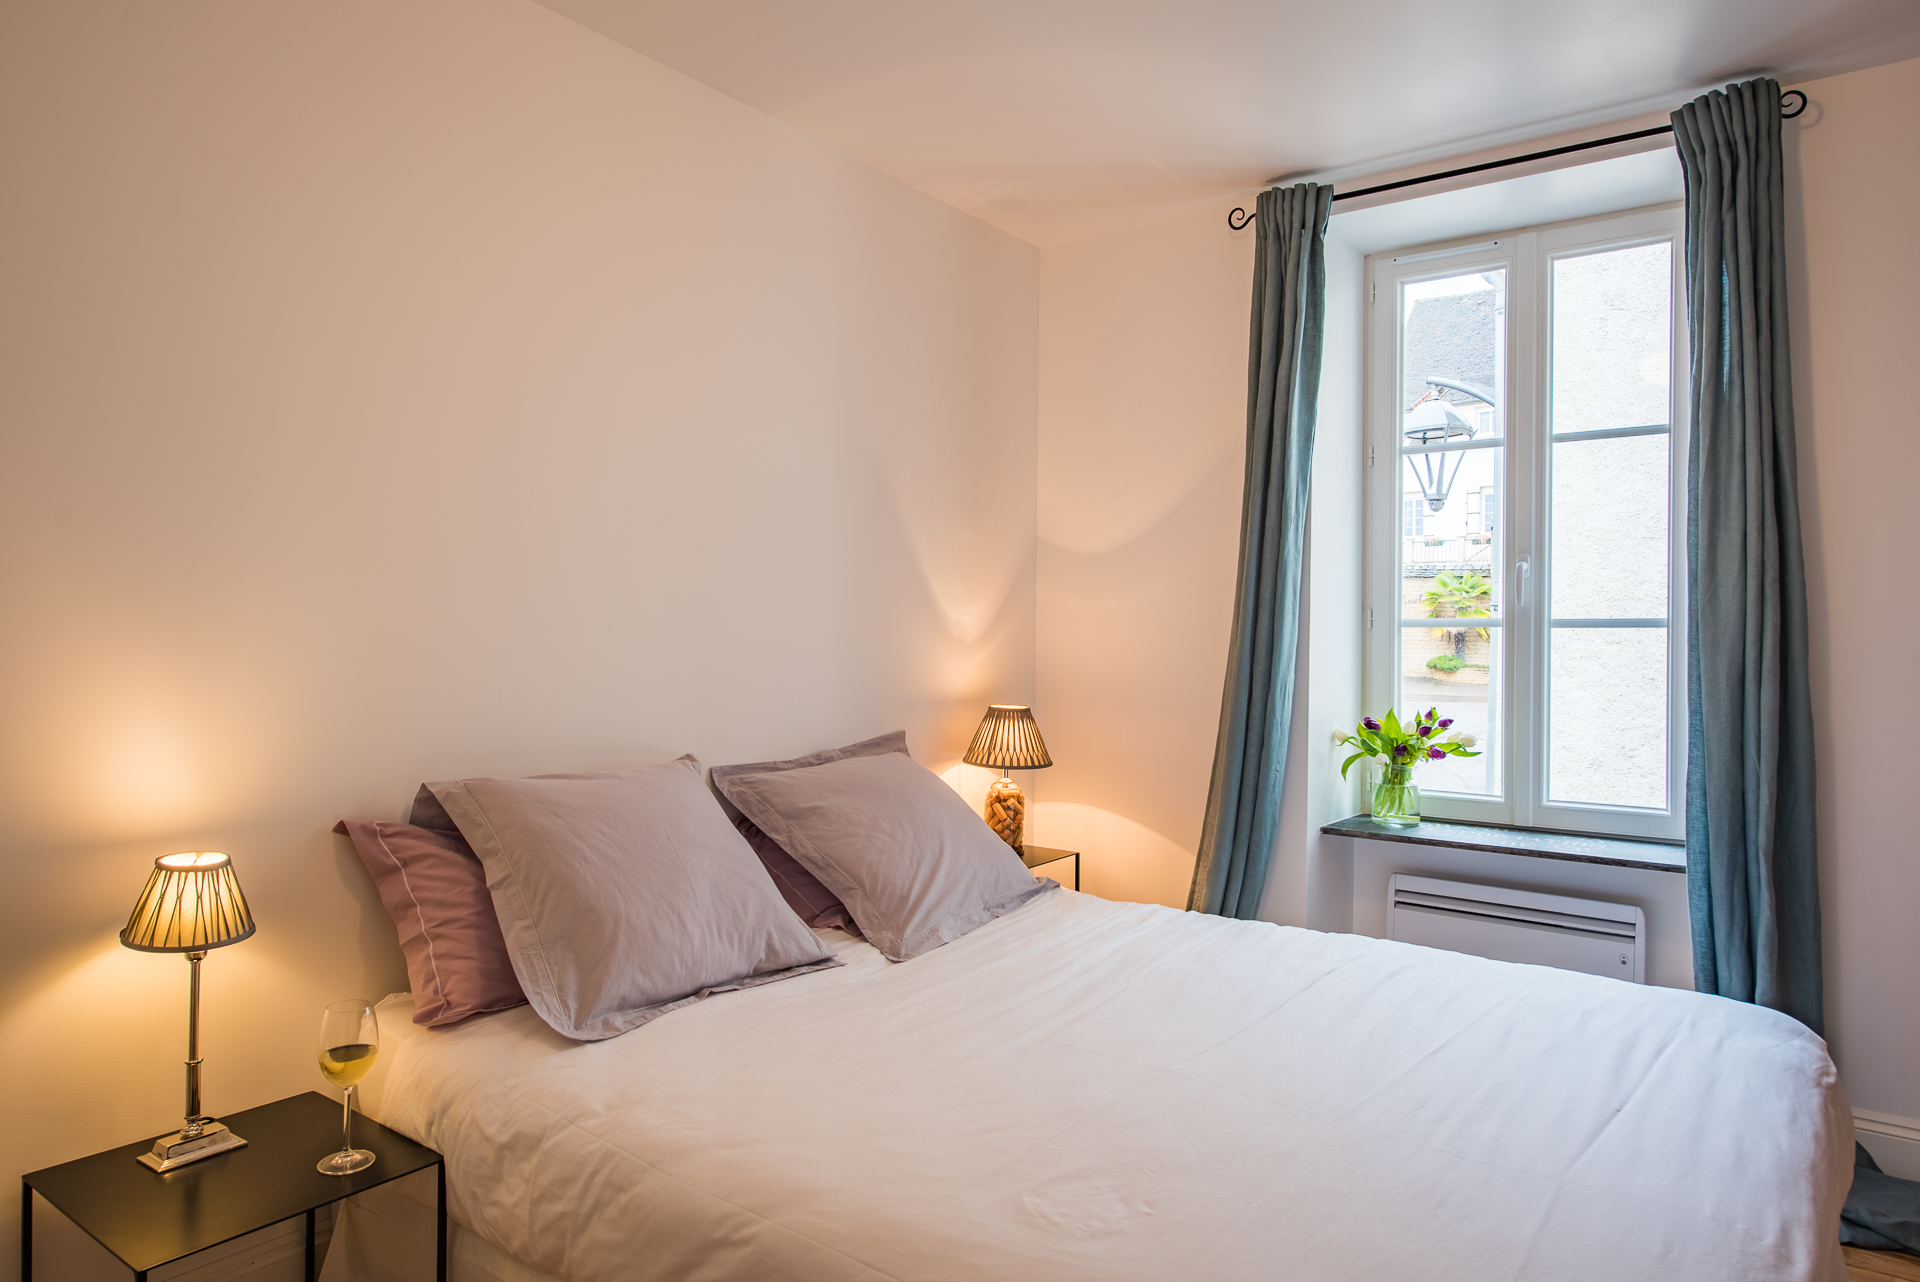 Chambre no 1/ Bedroom no 1 - Hervé Corcia